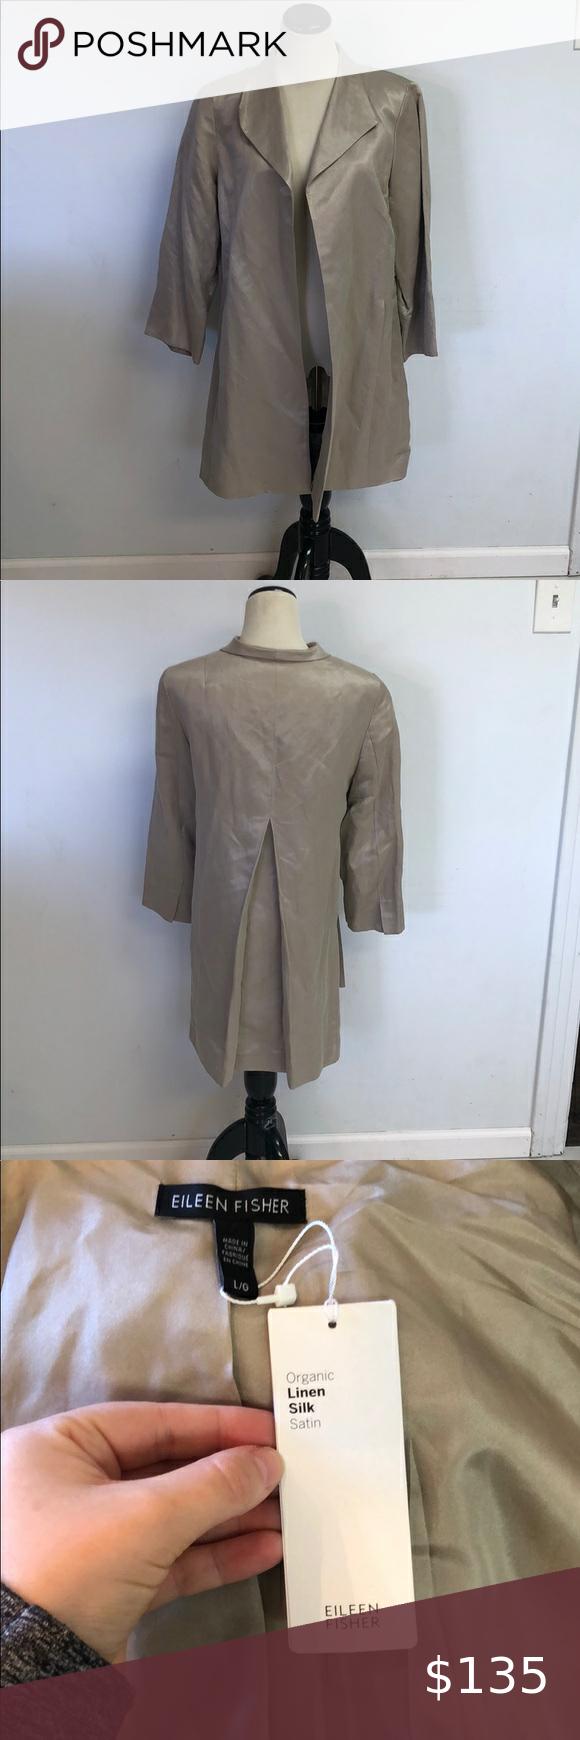 Eileen Fisher Organic Linen And Silk Coat Silk Coat Organic Linens Fashion [ 1740 x 580 Pixel ]